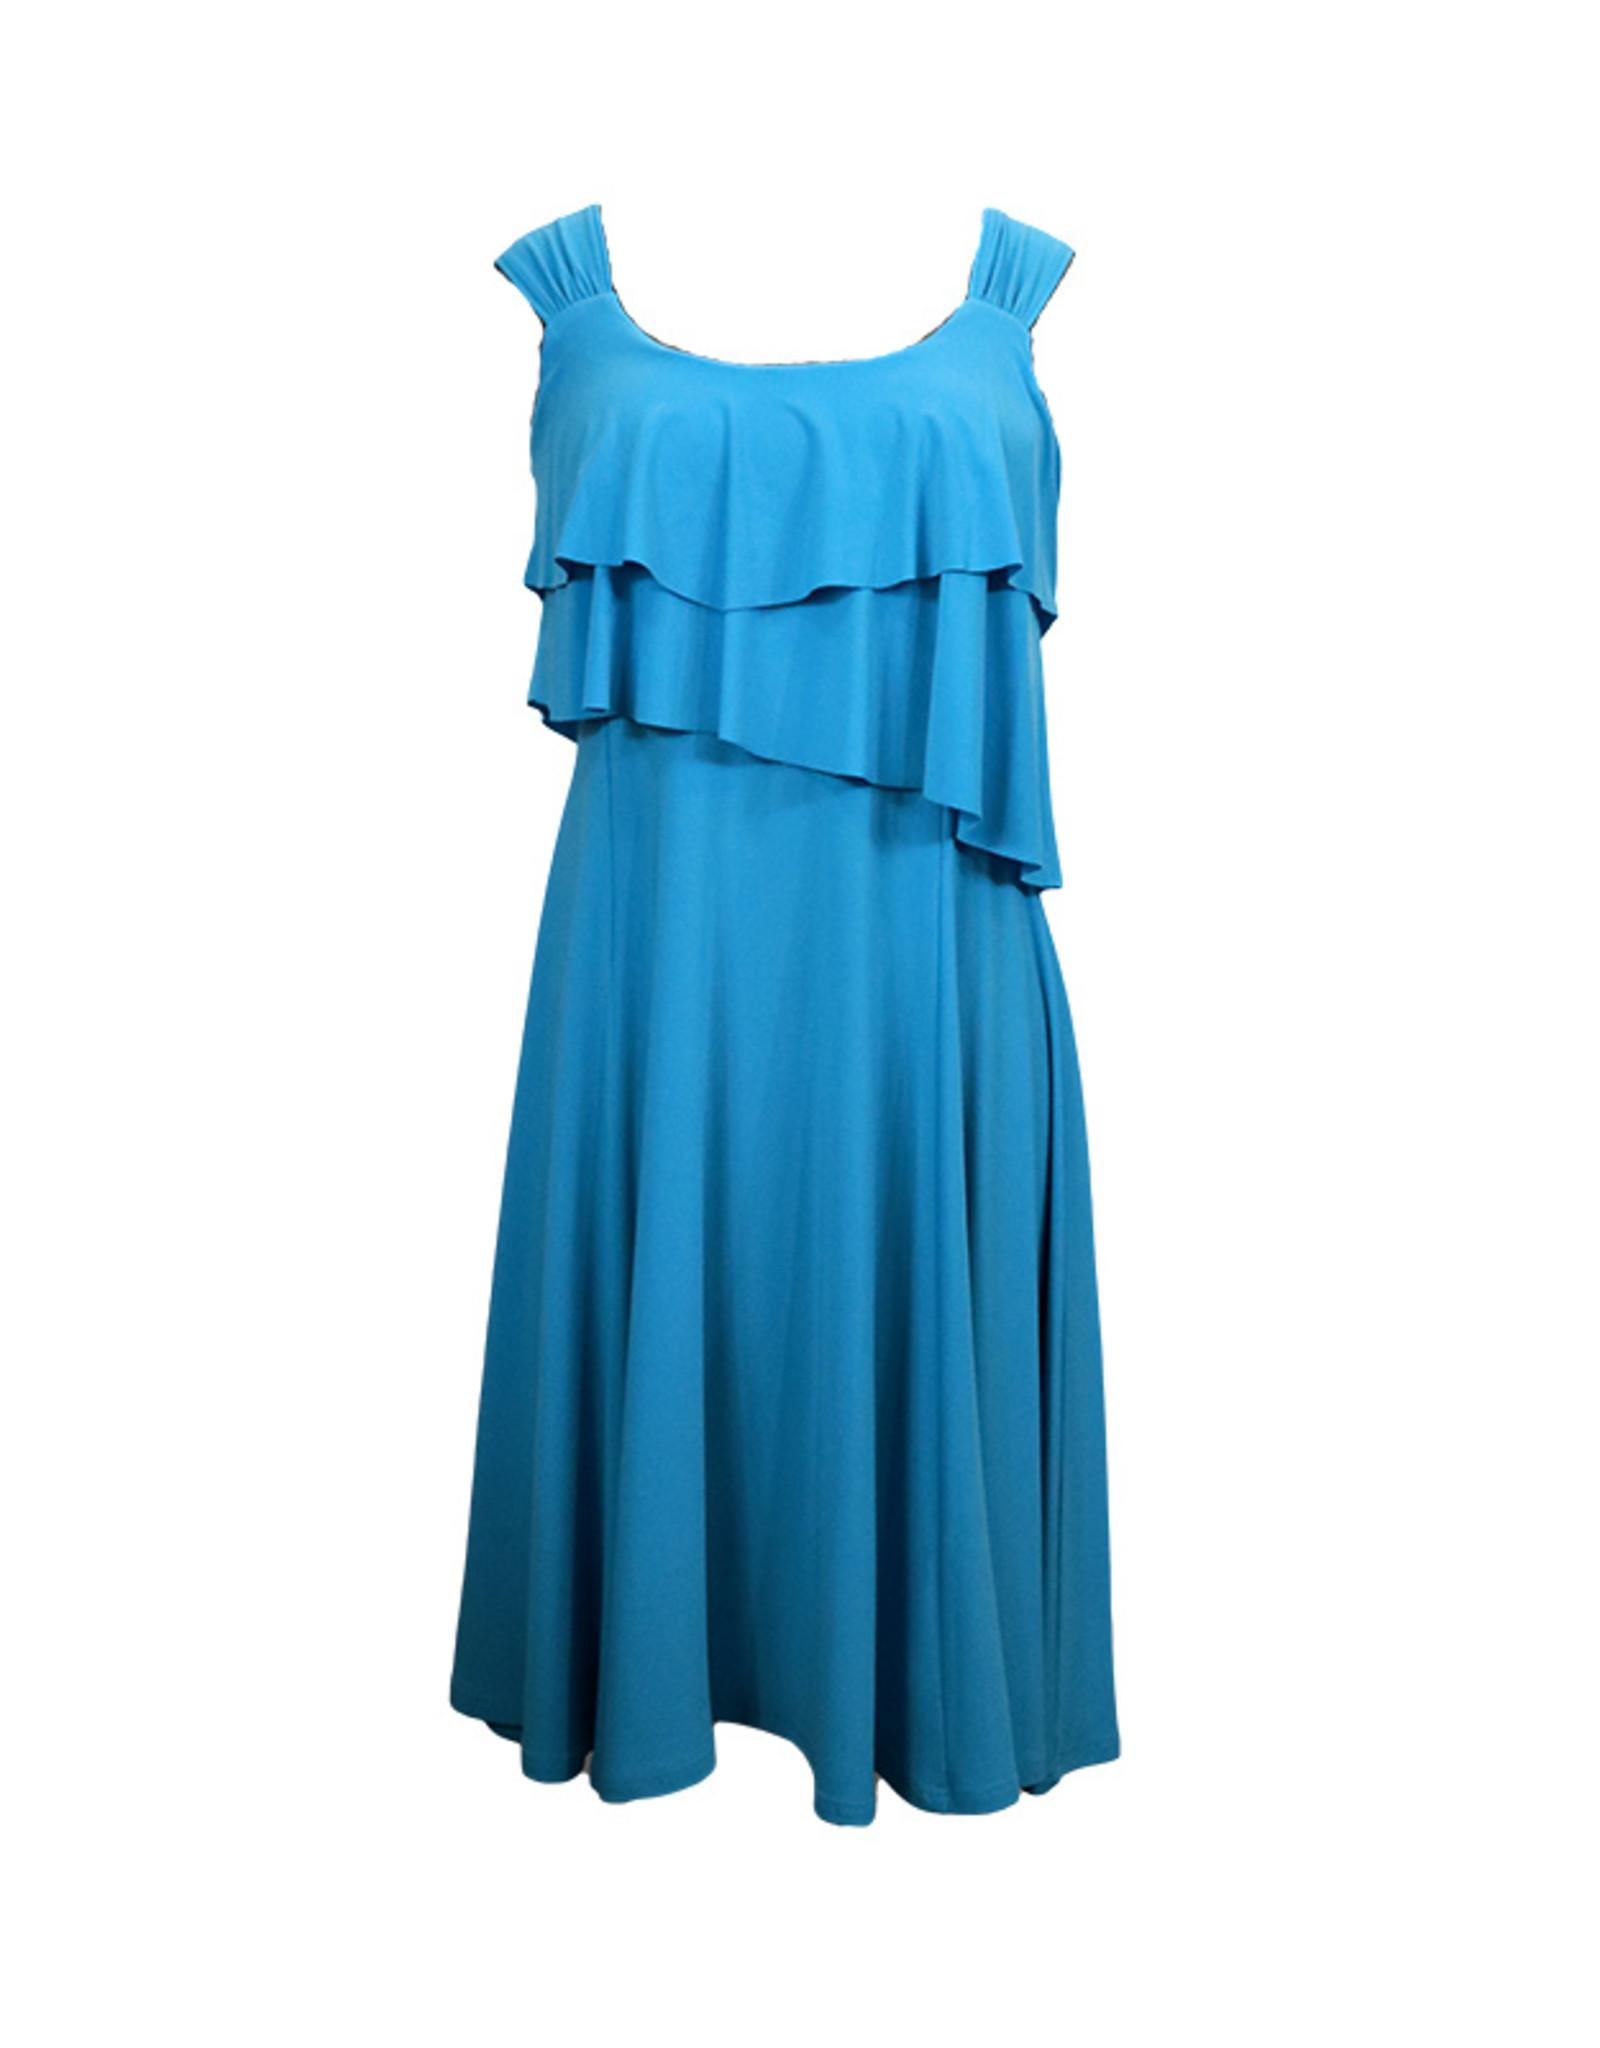 Double Ruffle Dress D2770